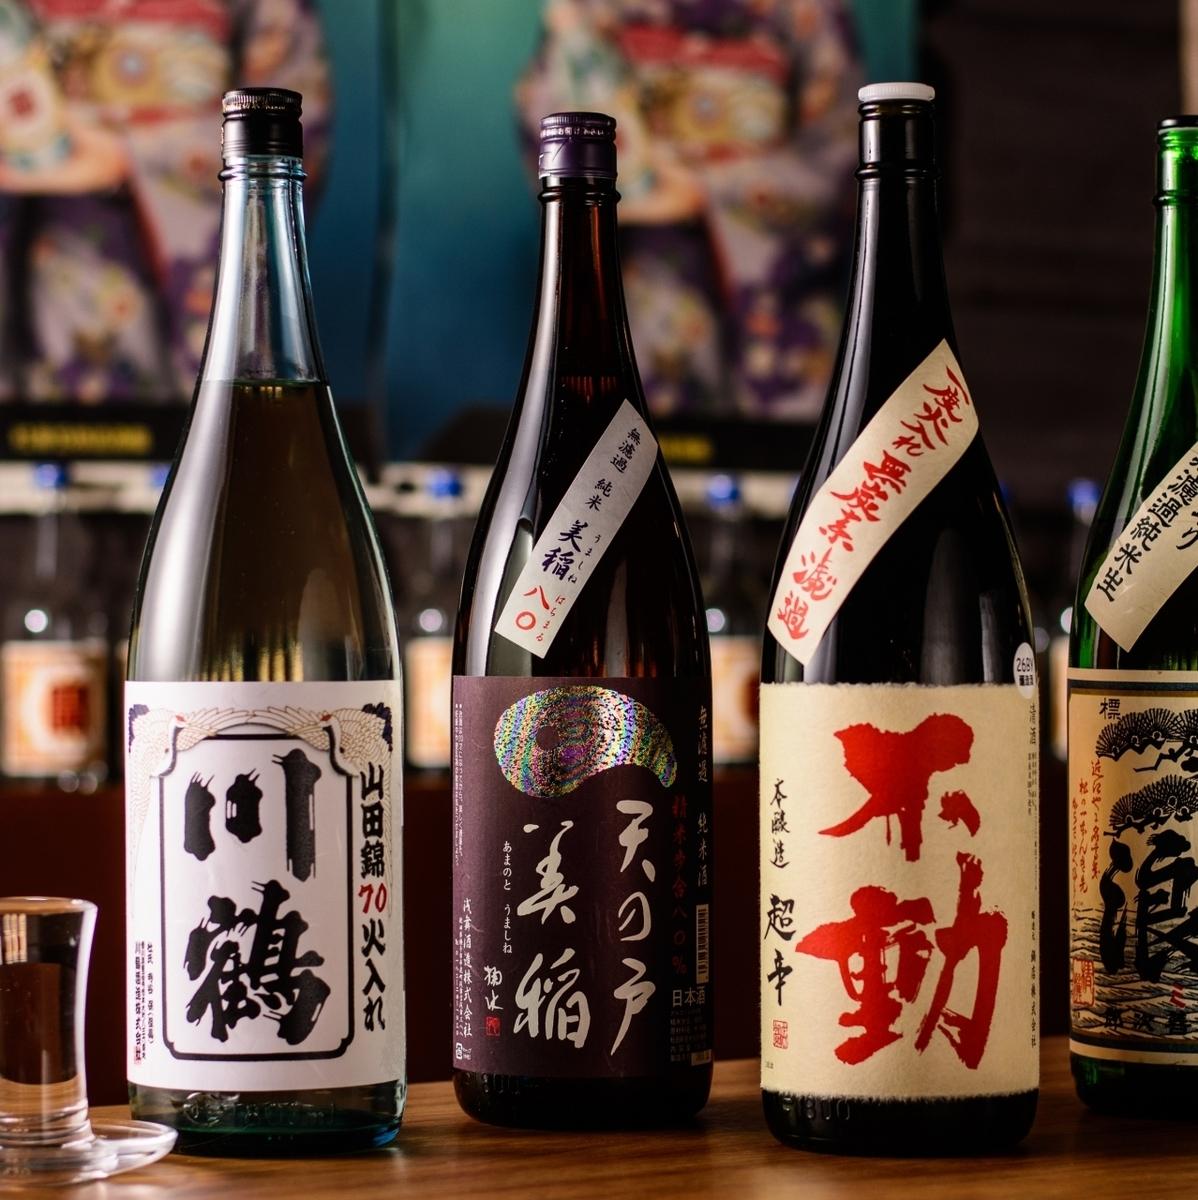 Hioka清酒490日元(不包括在内)〜!